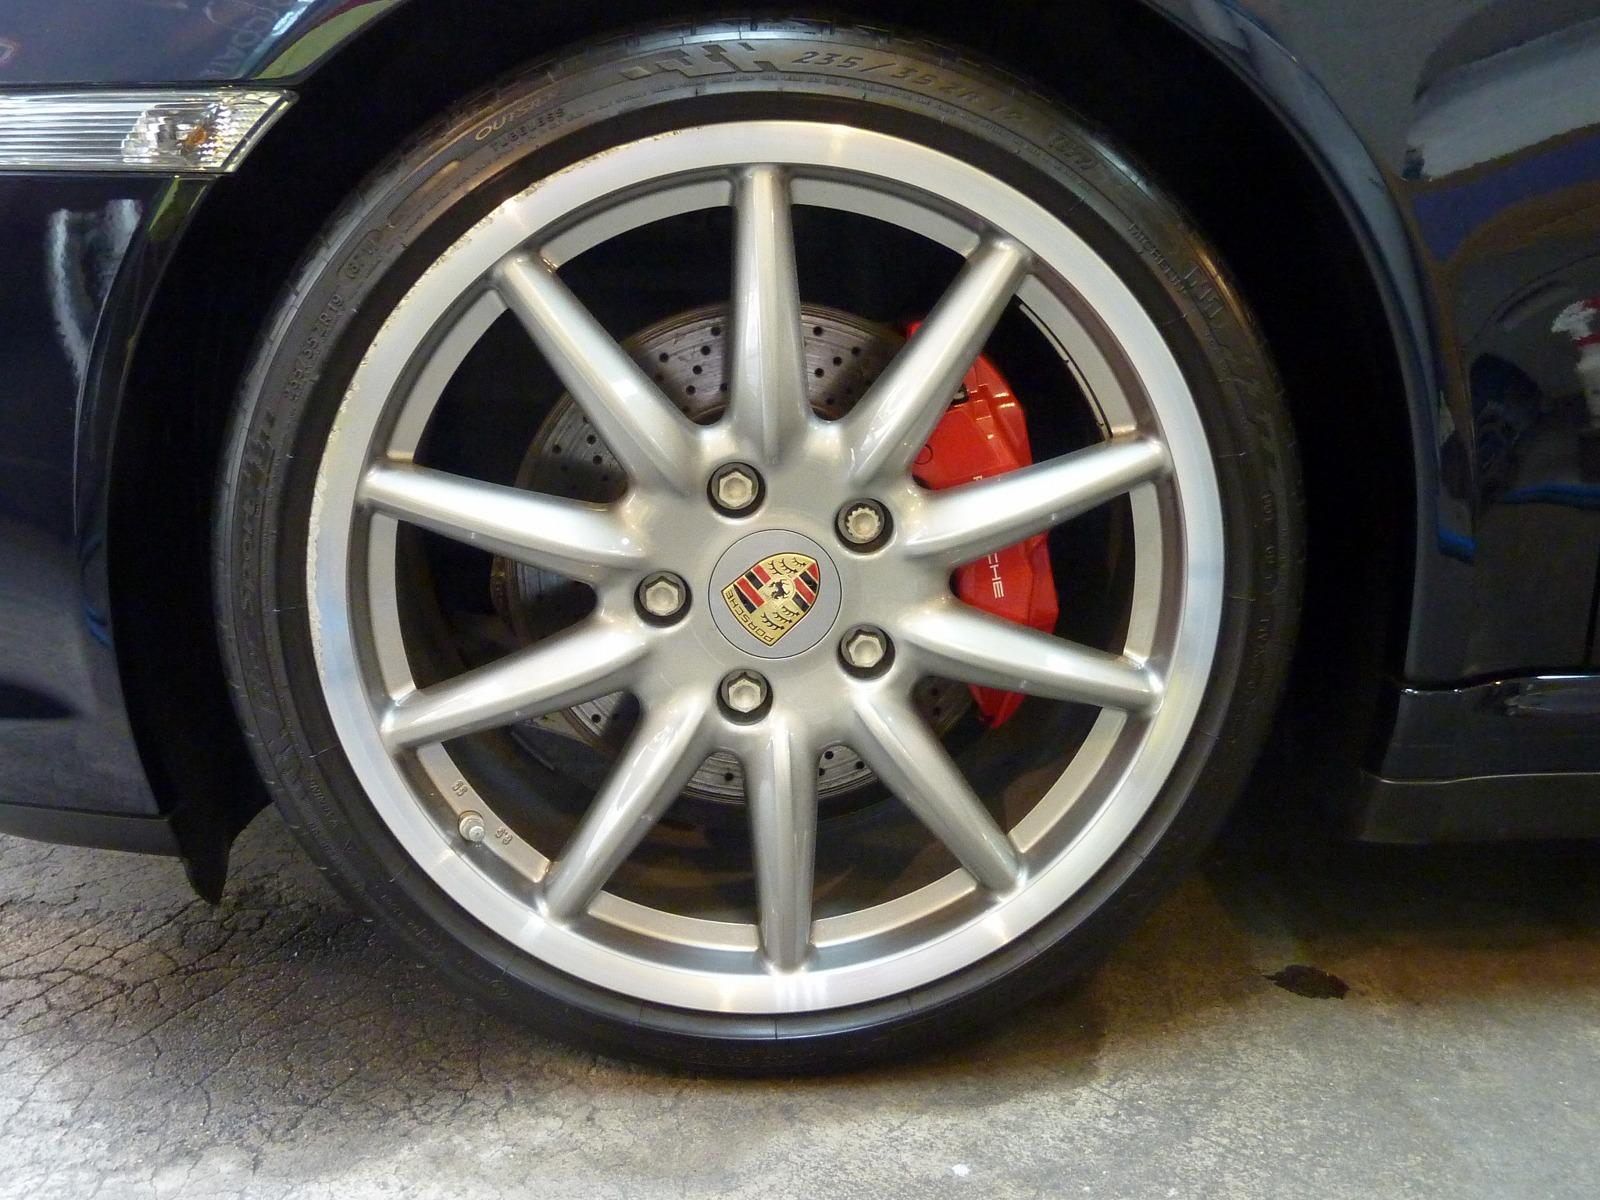 20130405-porshe-911-carrera-4s-cabriolet-11